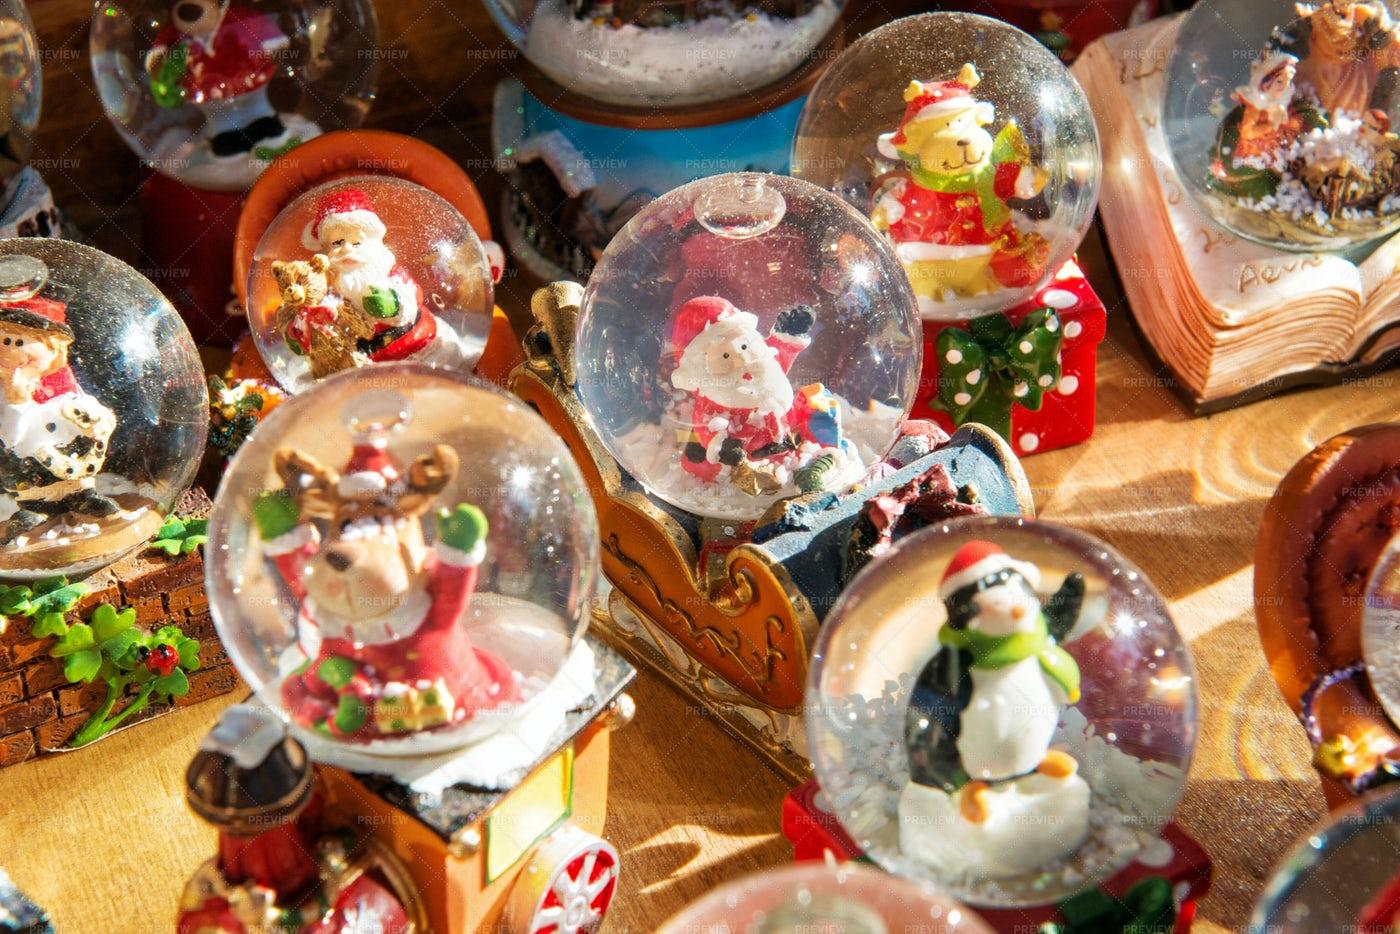 Colorful Christmas Snow Globes: Stock Photos